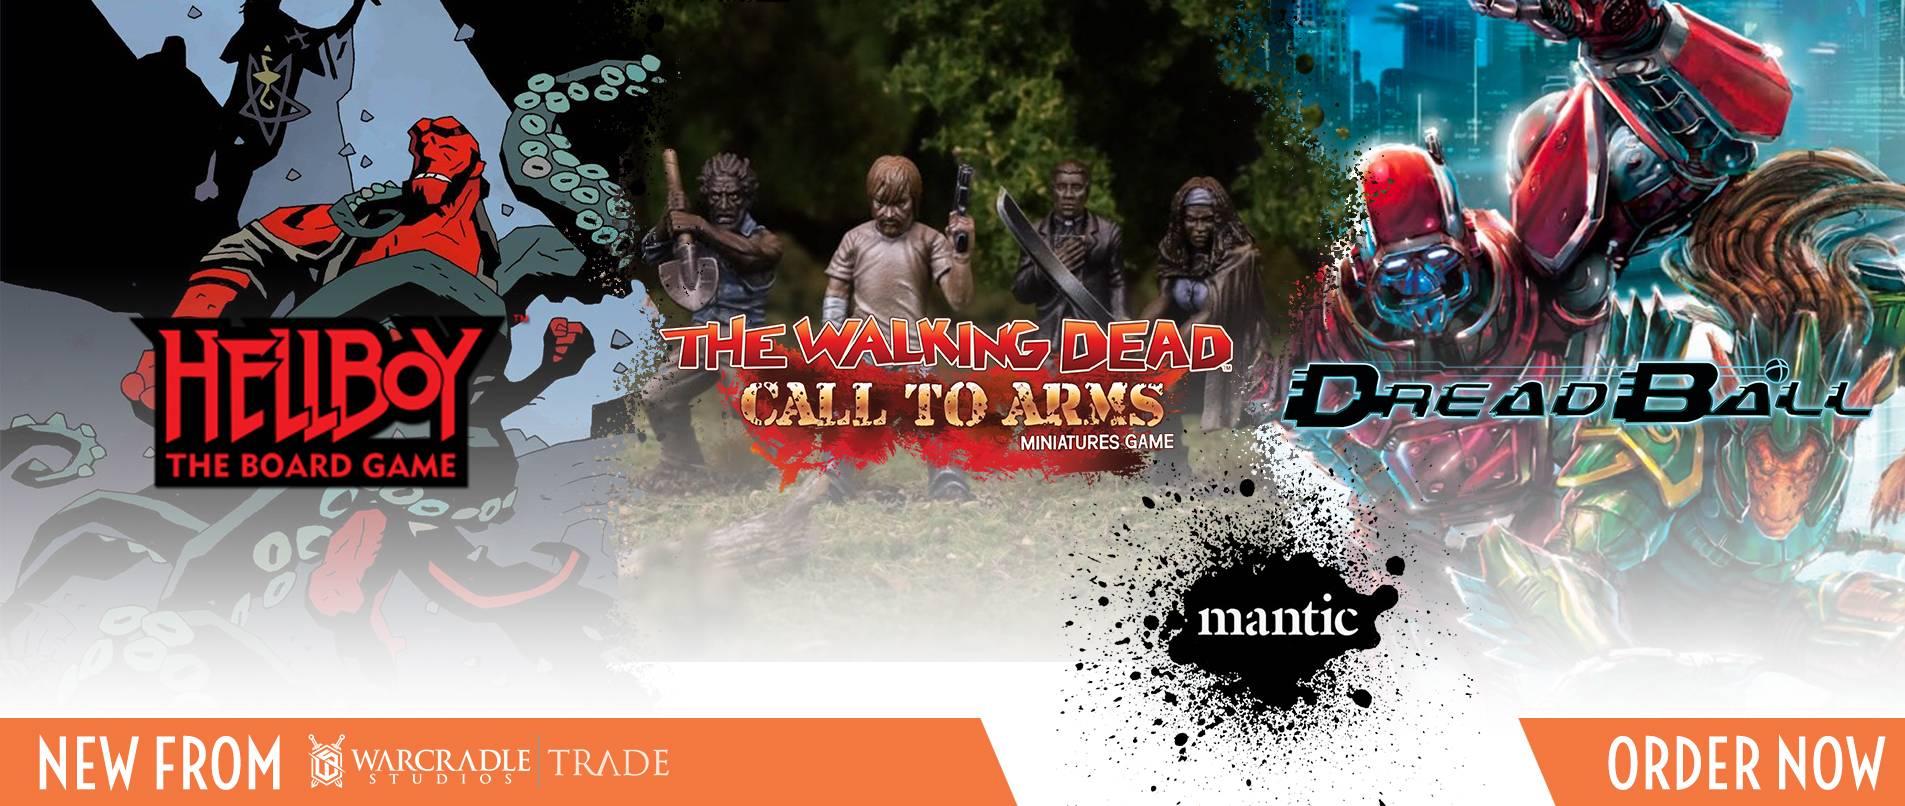 Mantic Games - Warcradle Distribution